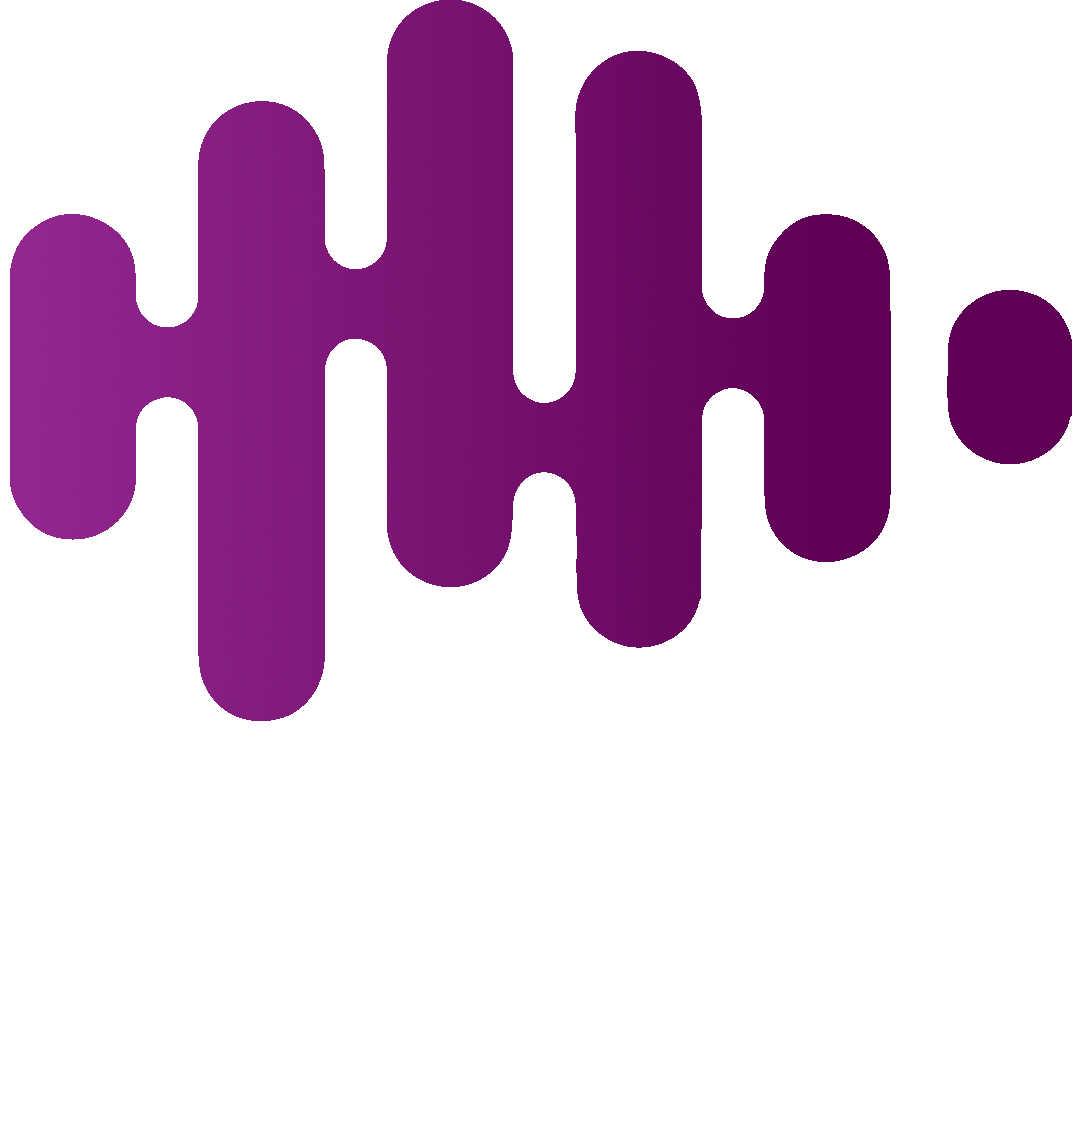 Tango Sound Studios